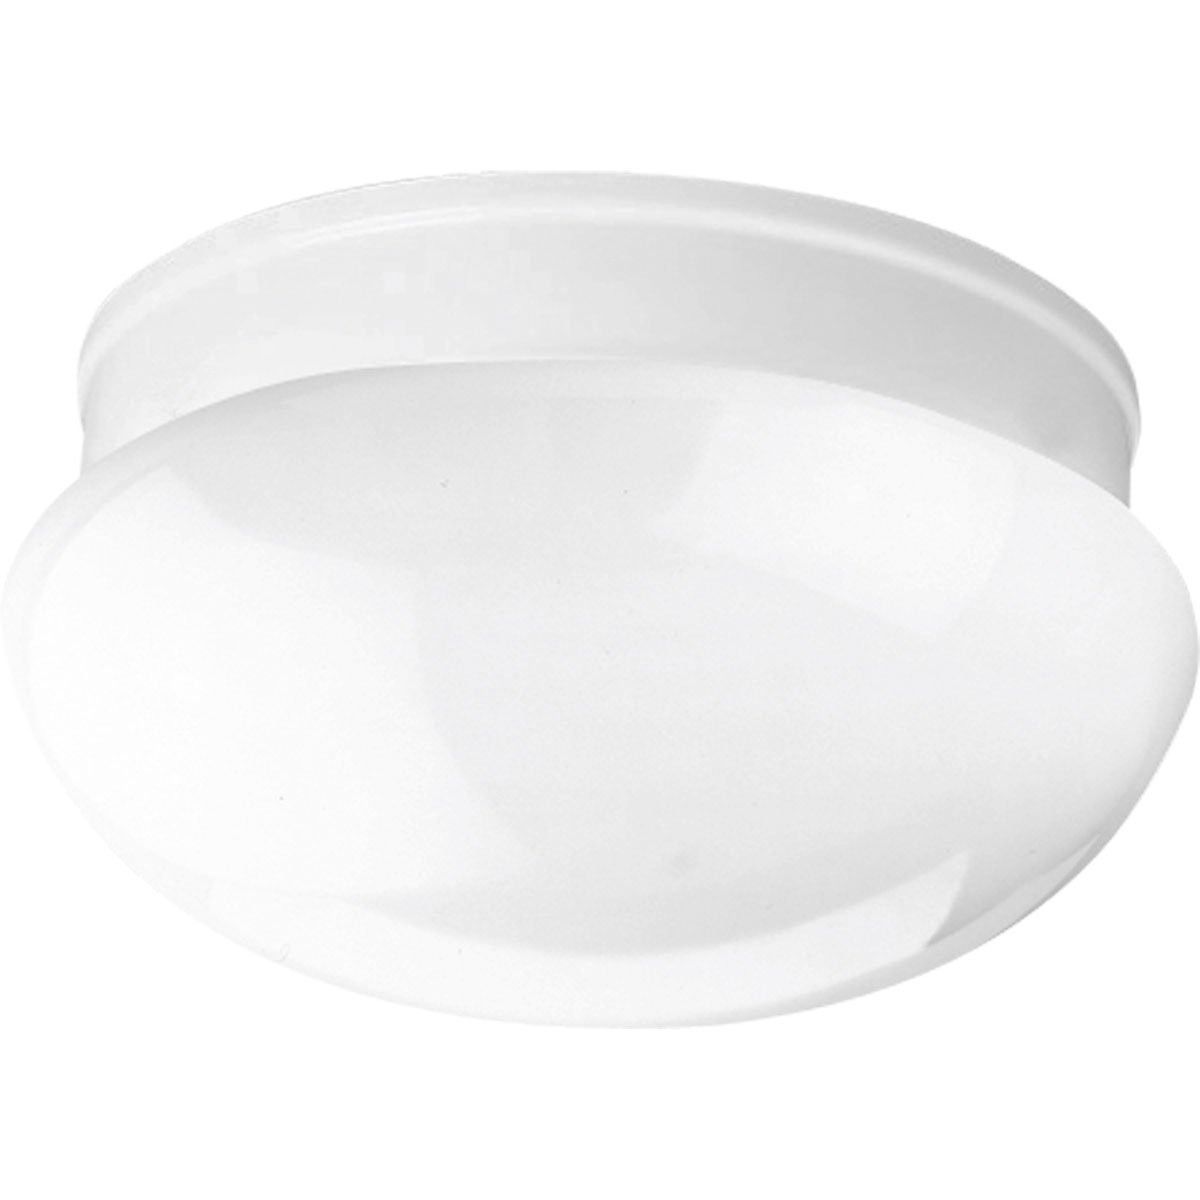 Progress Lighting P3410-30 2-Light Close-To-Ceiling Fixture, White